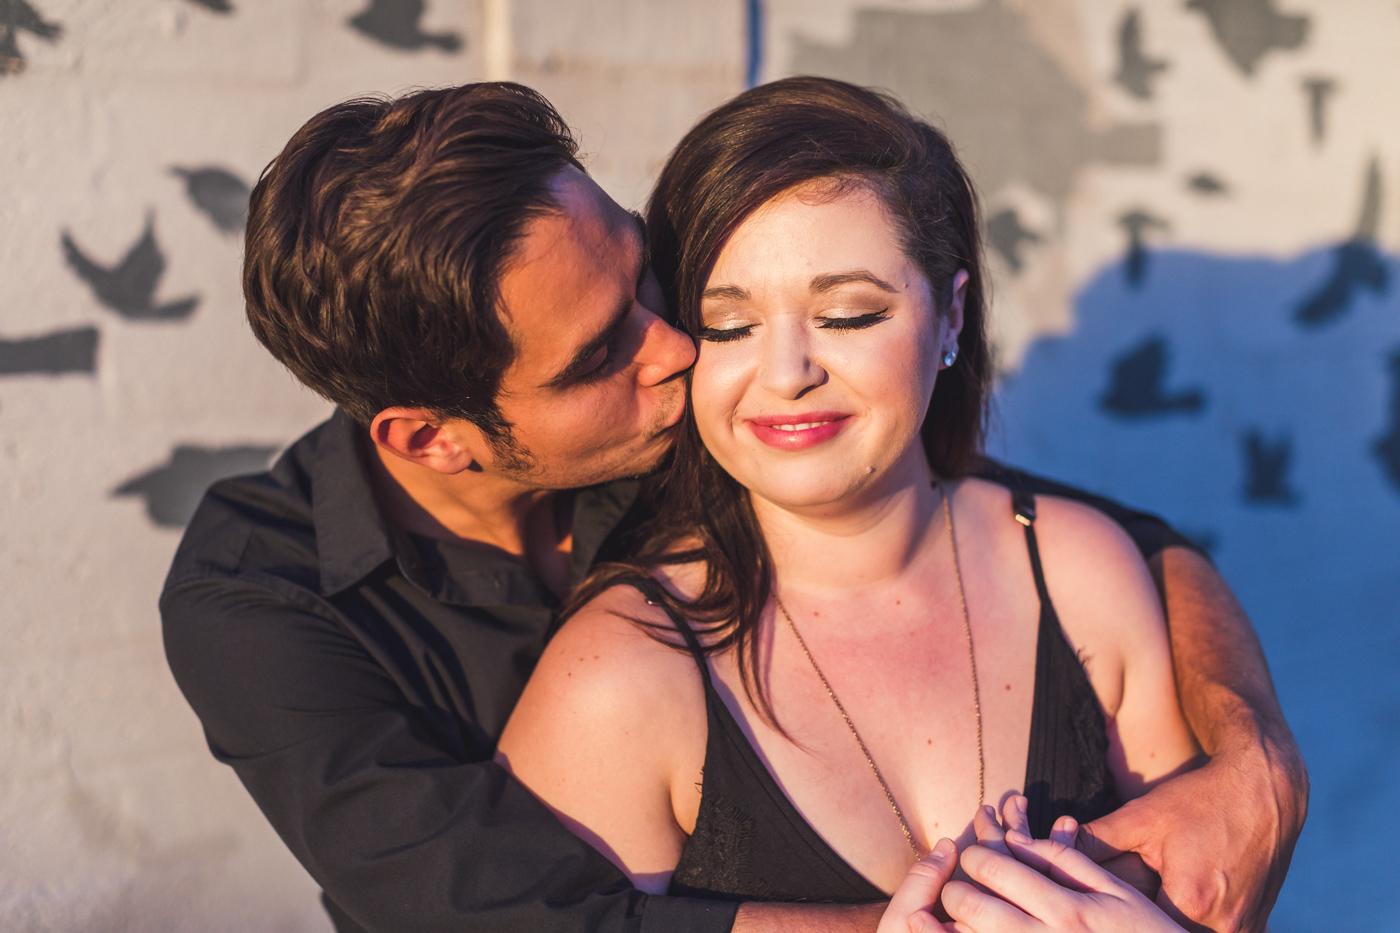 cuddling-and-kissing-portrait